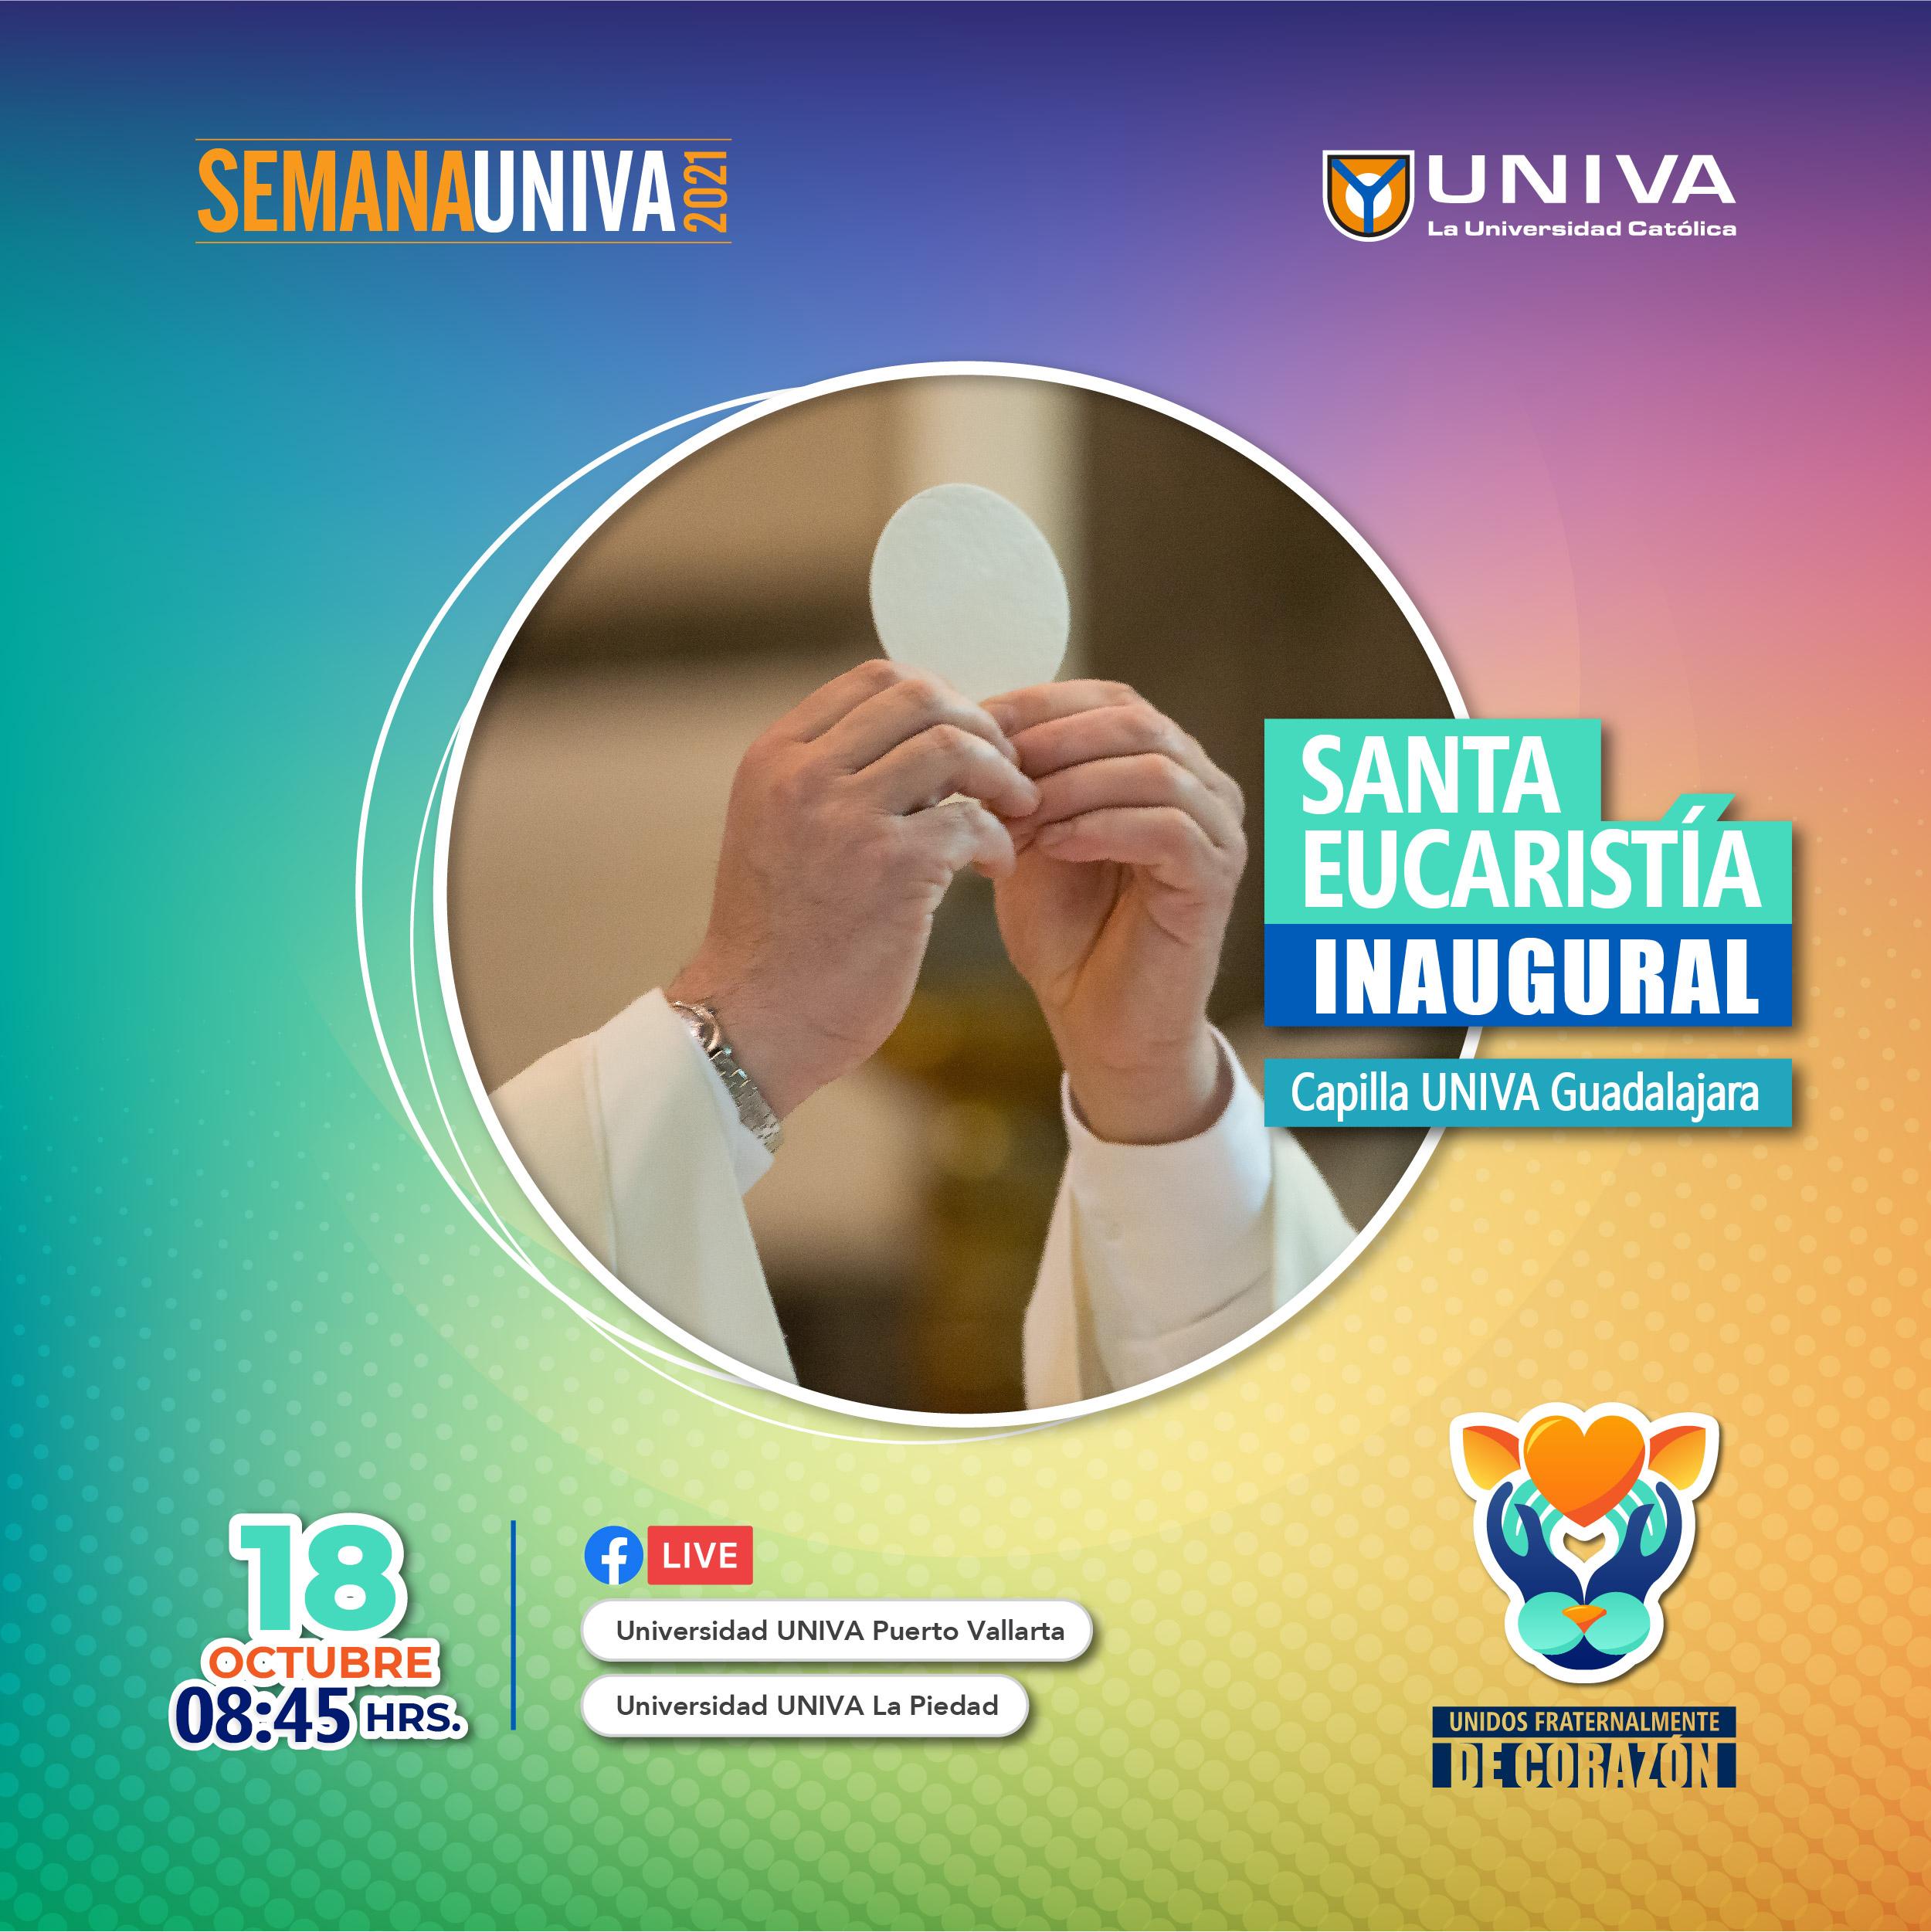 Santa Eucaristía Inaugural Semana UNIVA 2021